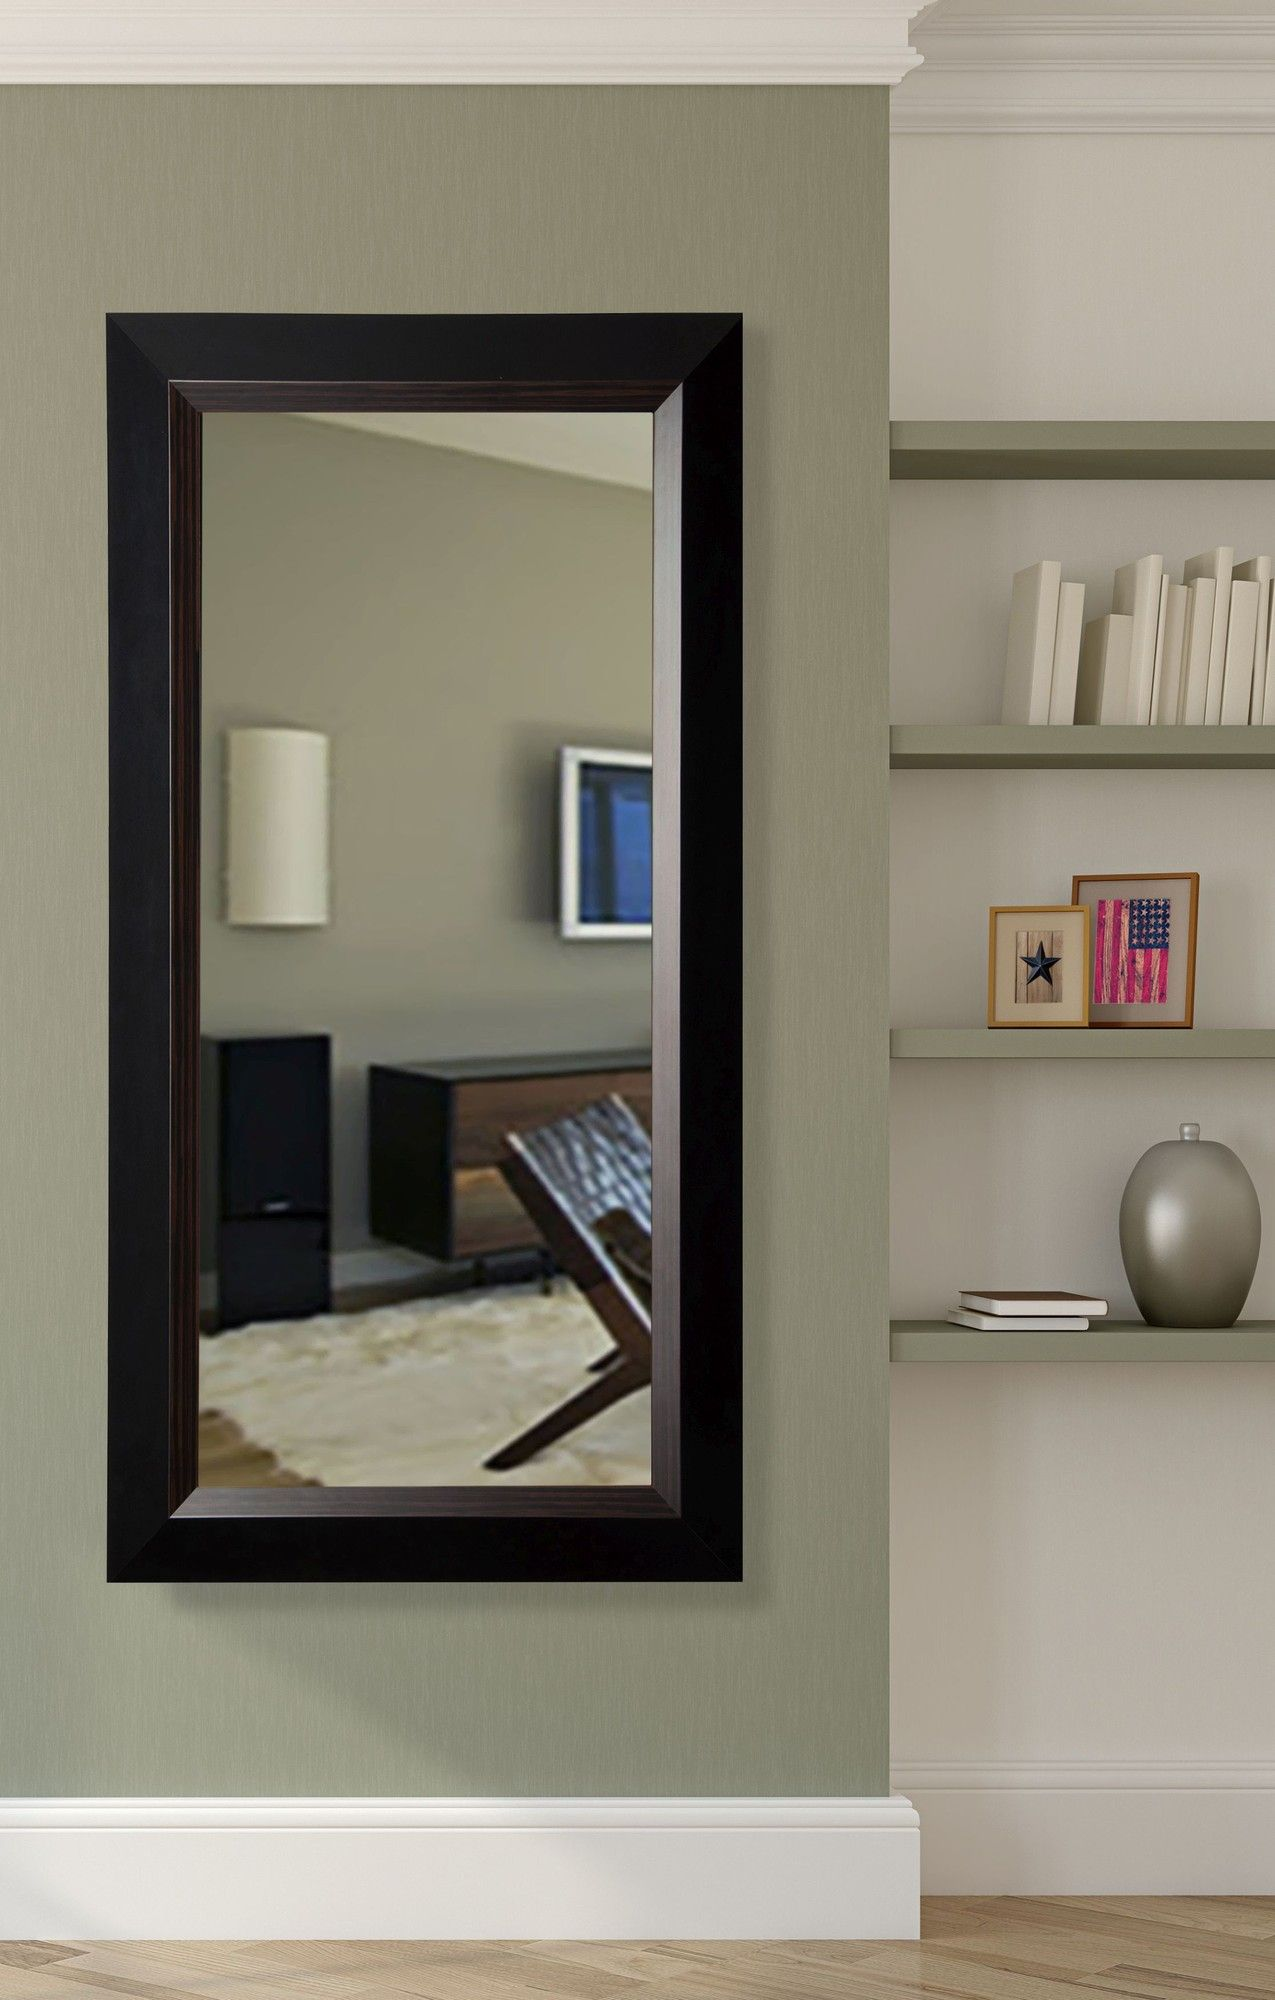 Brown Lining Tall Mirror | Tall mirror, Floor mirror ...